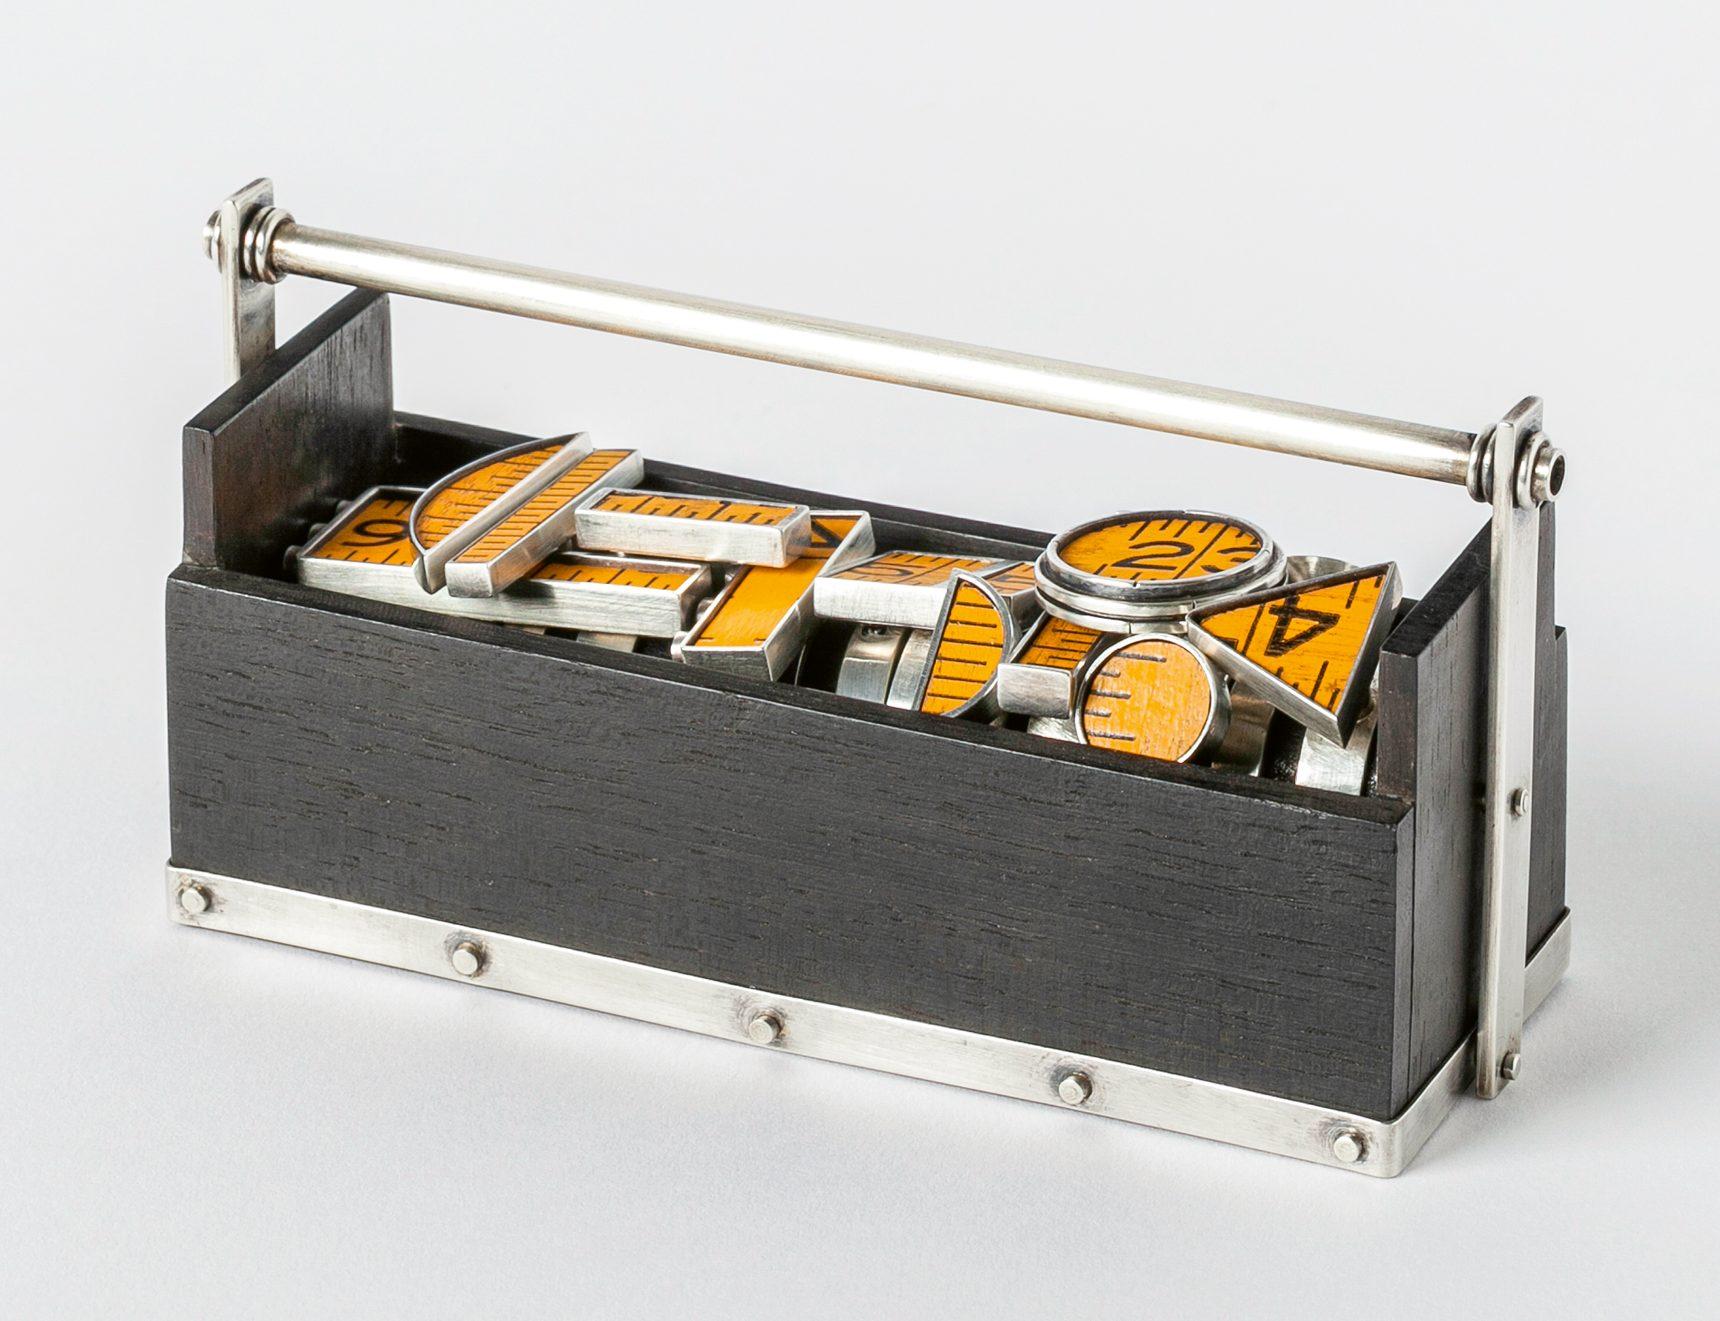 Kiff Slemmons, Overruled, ringen, 1996. Collectie Die Neue Sammlung. Foto Alexander Laurenzo, duimstok, zilver, ebbenhout